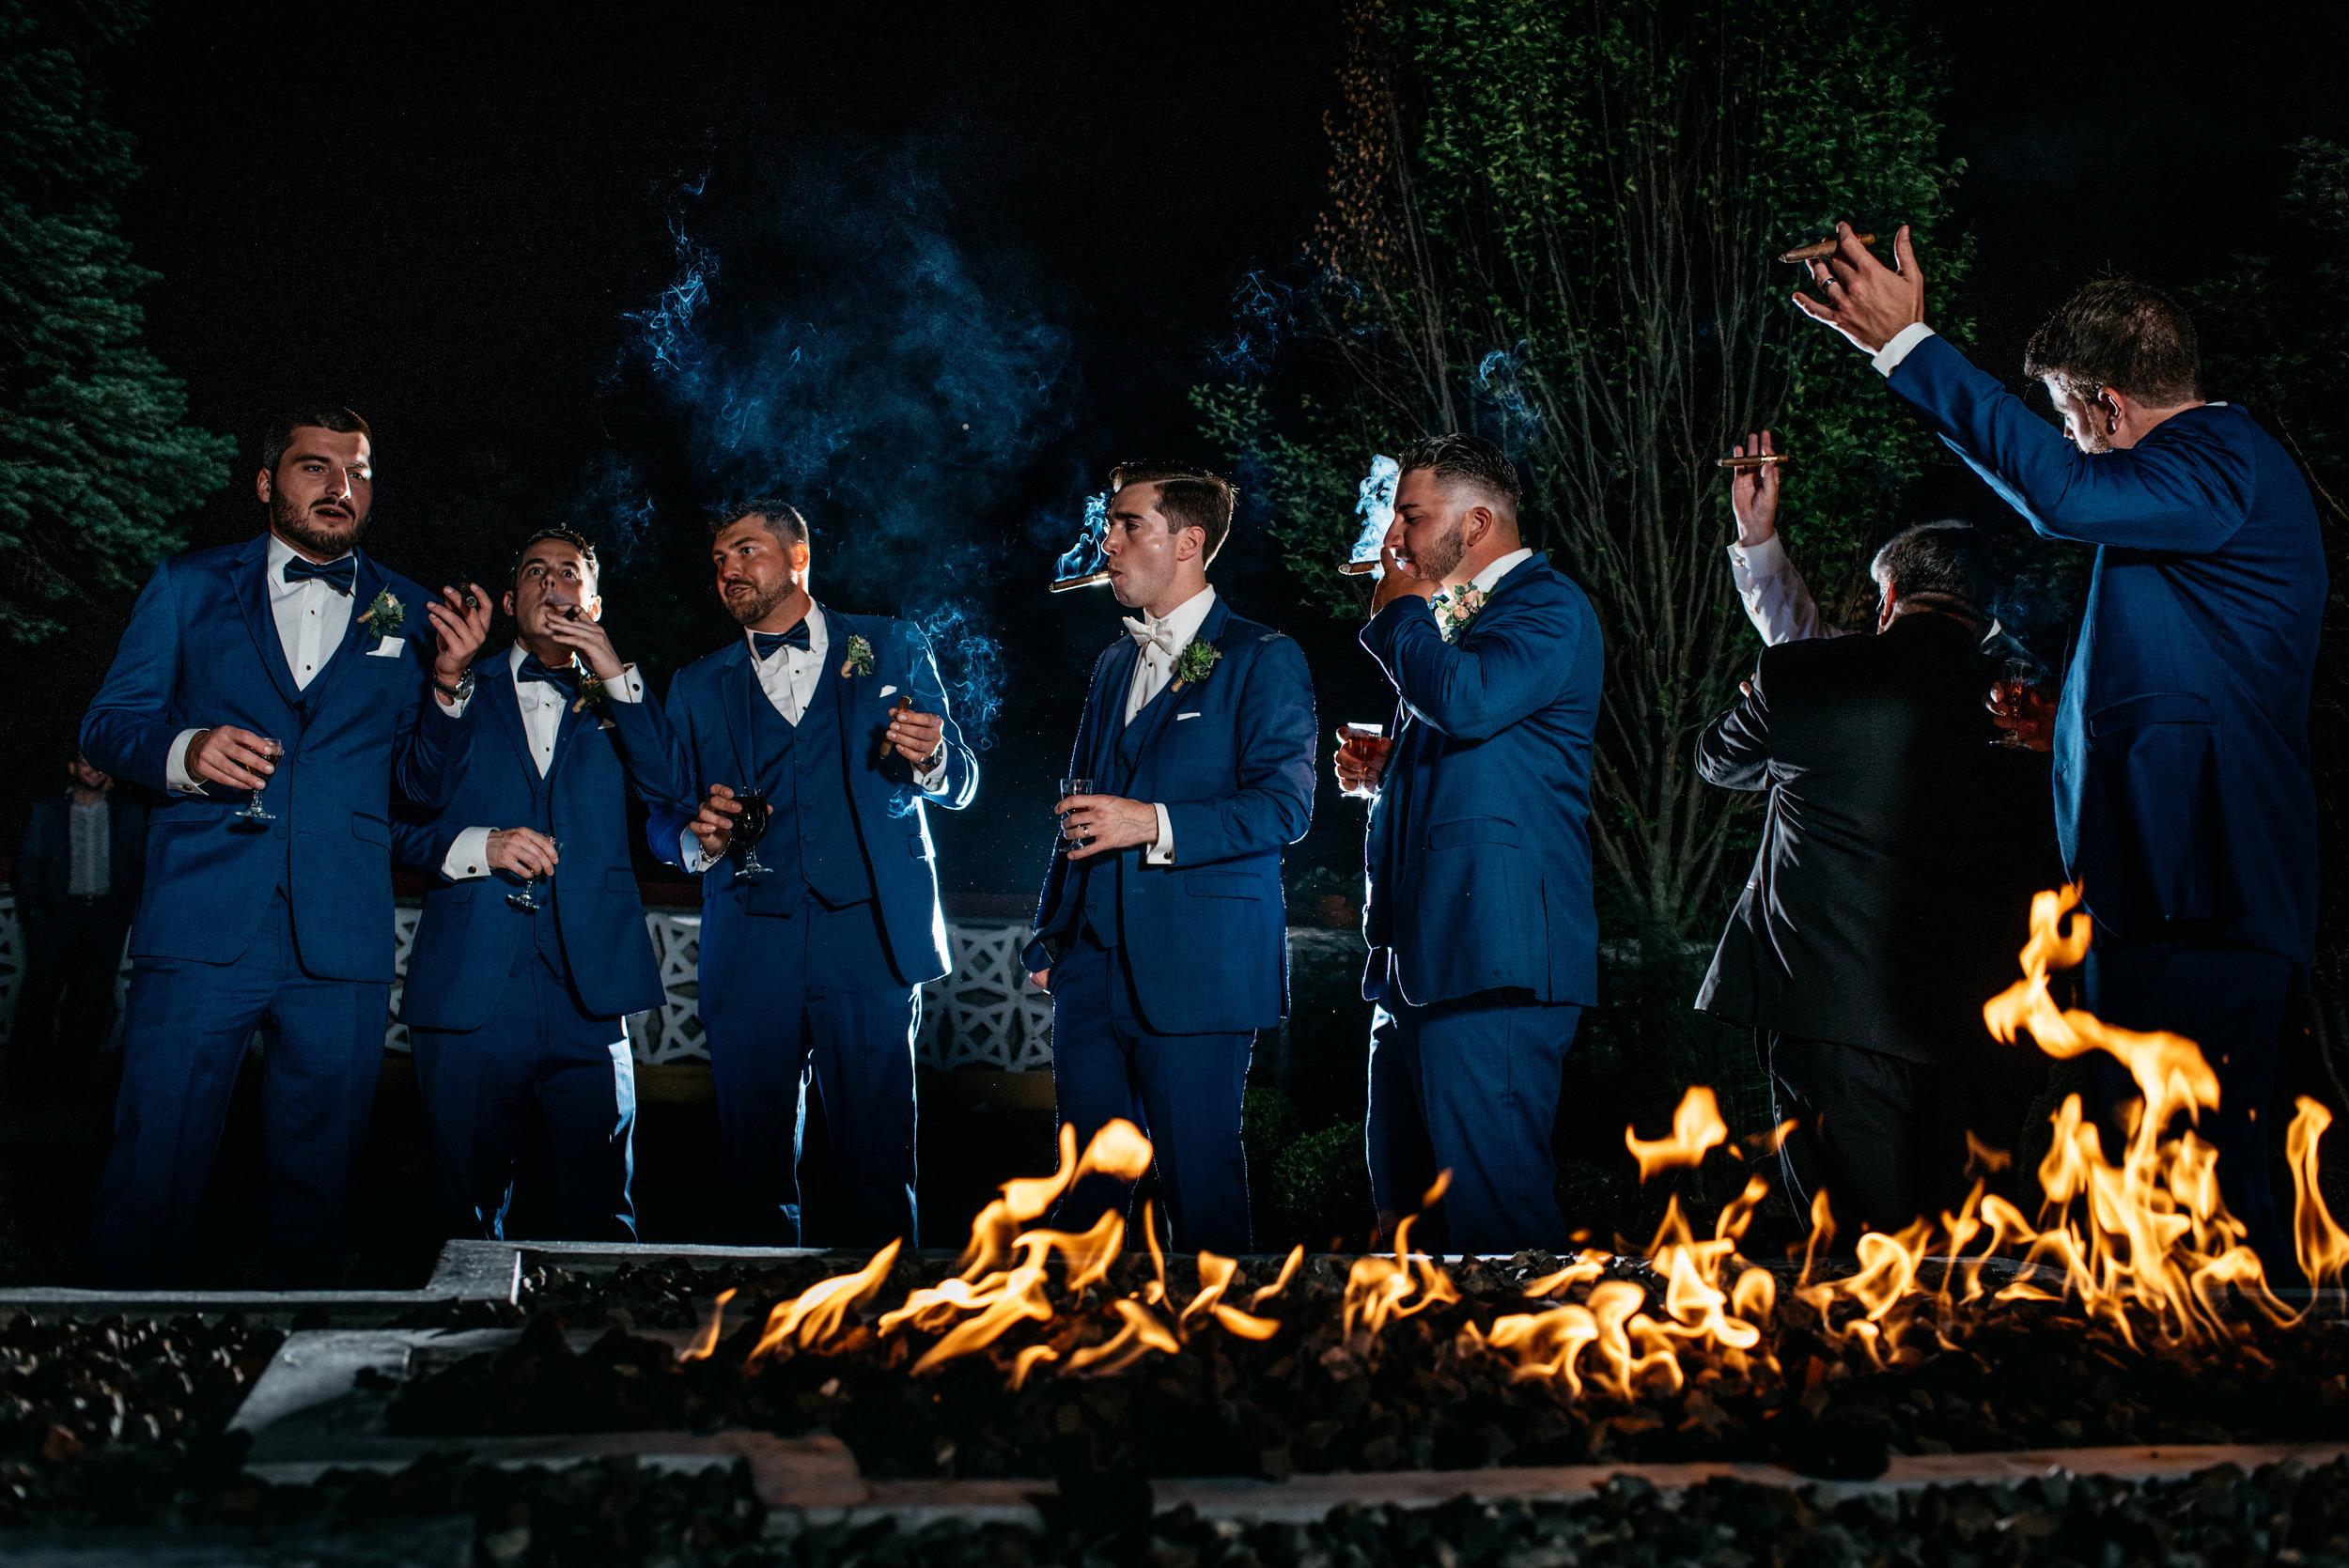 WeddingPhotos | NJPhotographer | Highlights-14.jpg